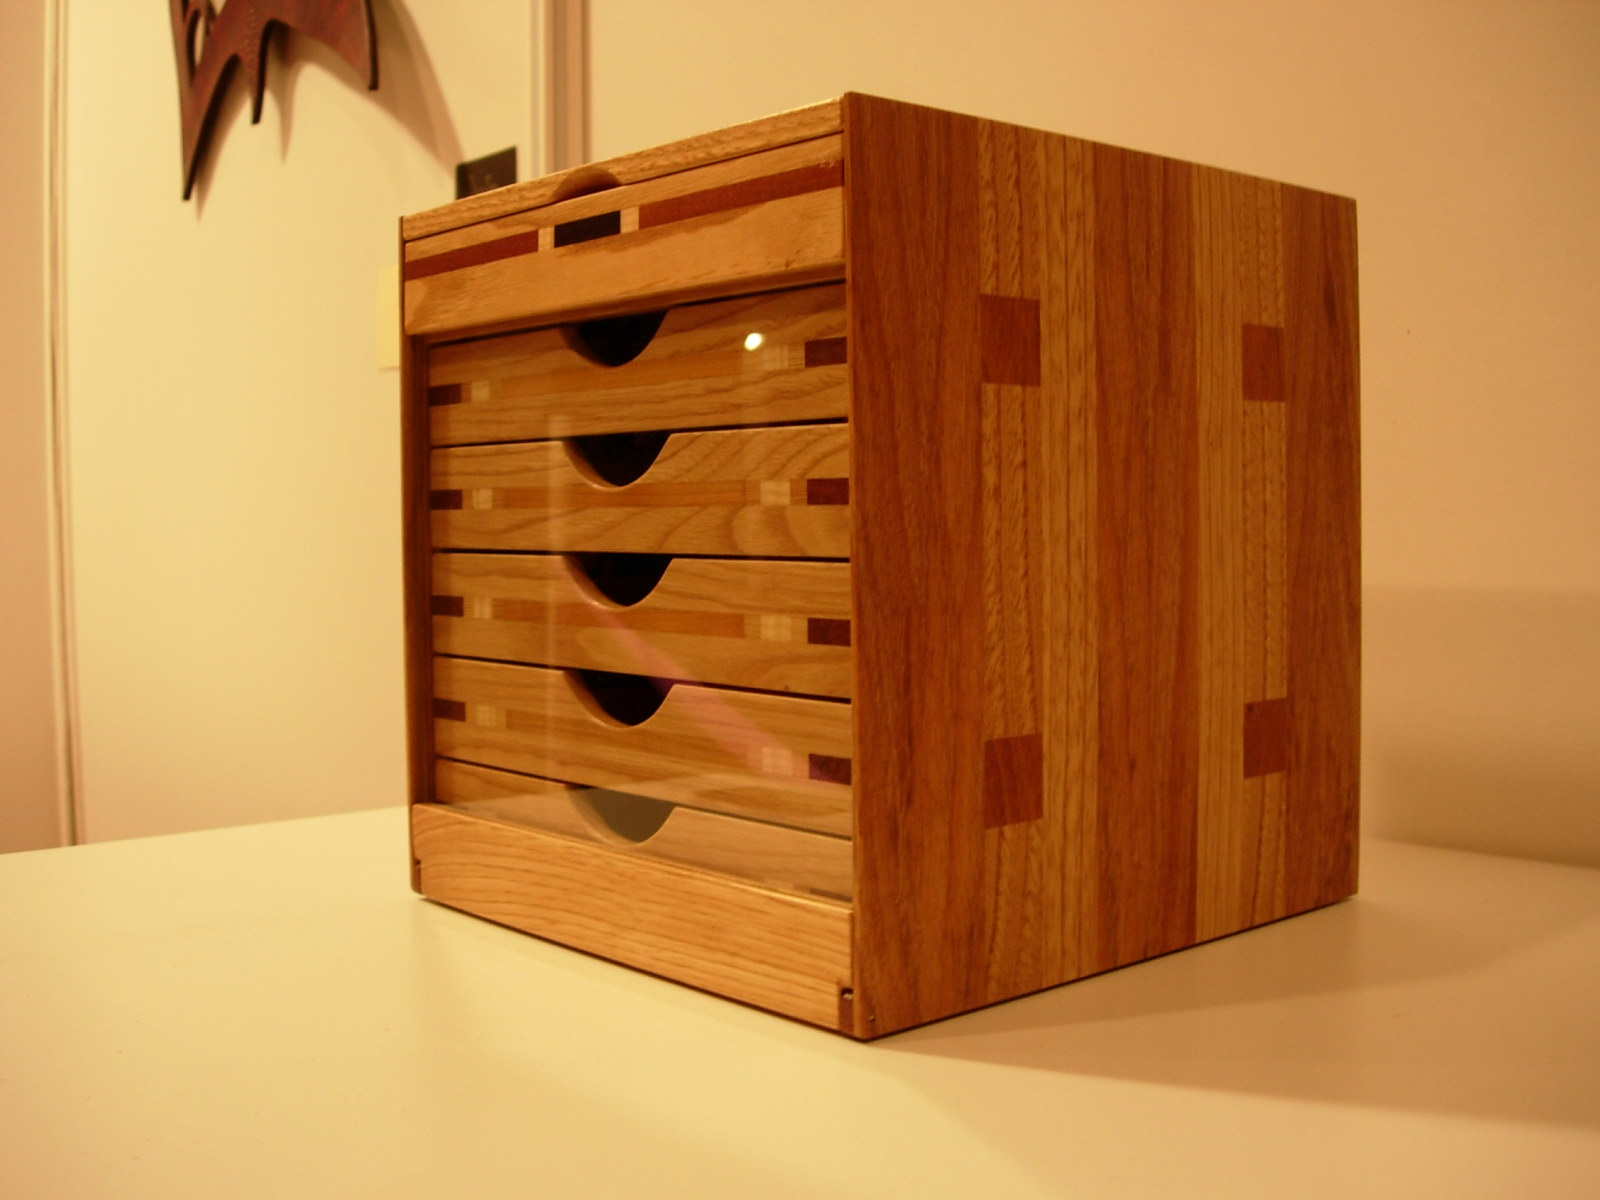 sjuan ebanister a en madera en bilbao muebles artesanales